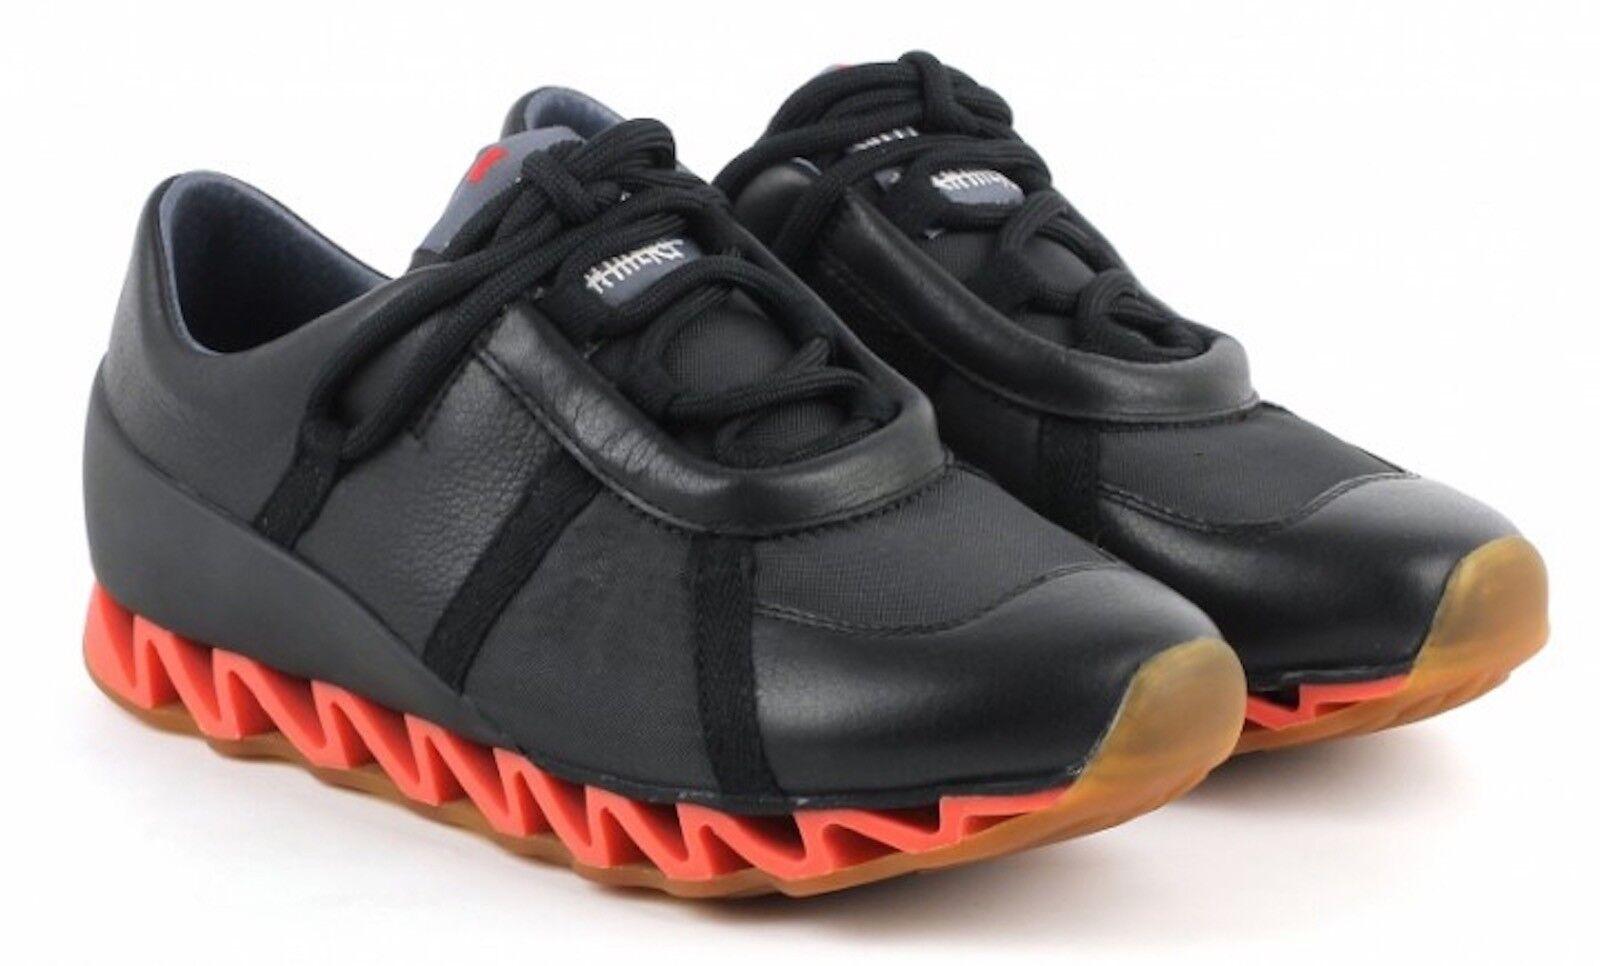 Bernhard Willhelm X Camper 22050-002 Together Sneakers shoes US 7 EU 37